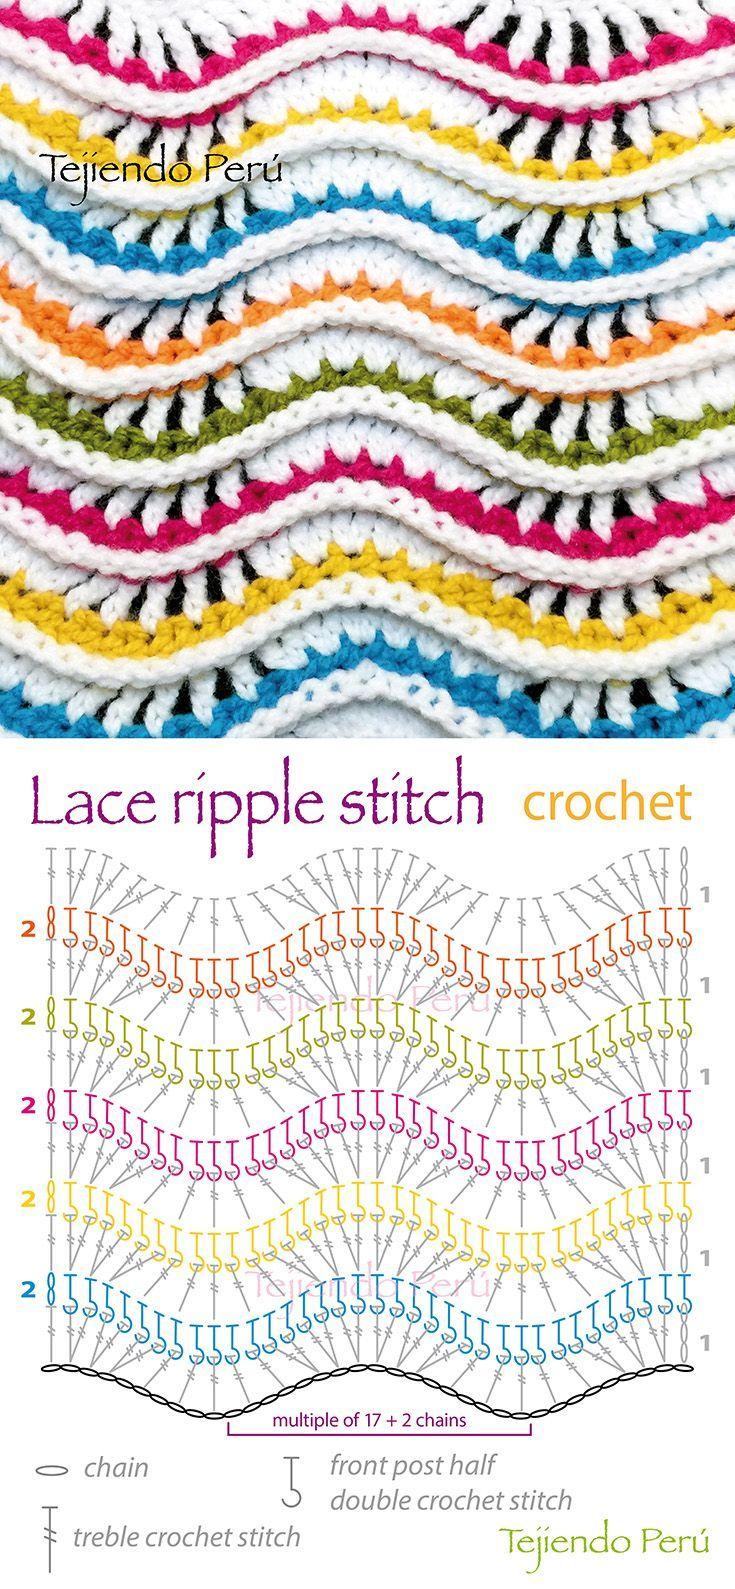 Pin by Heidi Diefenbach Brennan on Knitting/Crochet | Pinterest ...